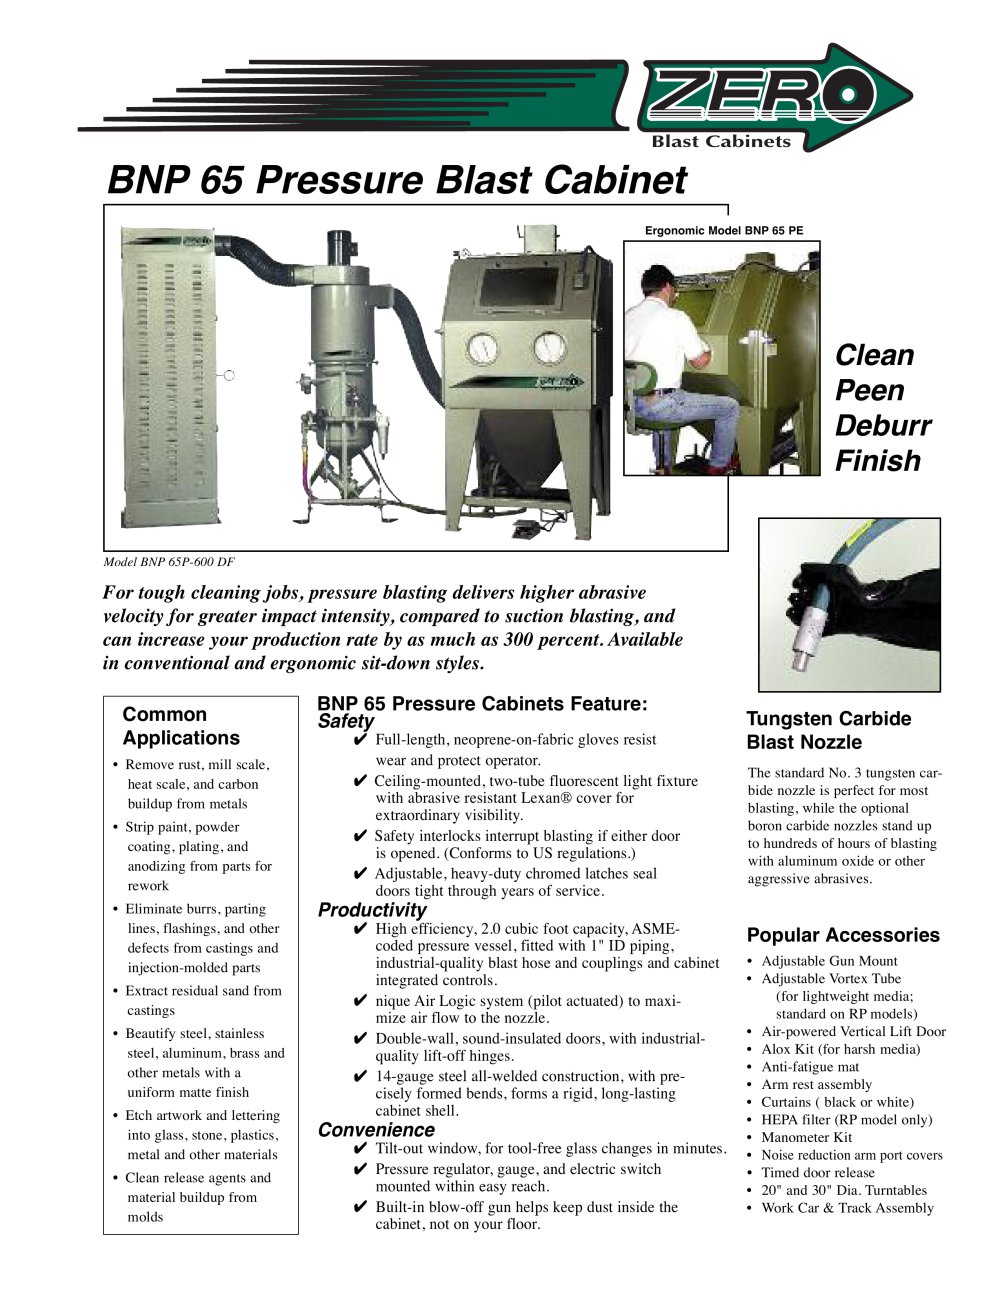 Clemco Industries Blast Cabinets Bnp 65 Pressure Blast Cabinet Rev E Clemco Industries Pdf